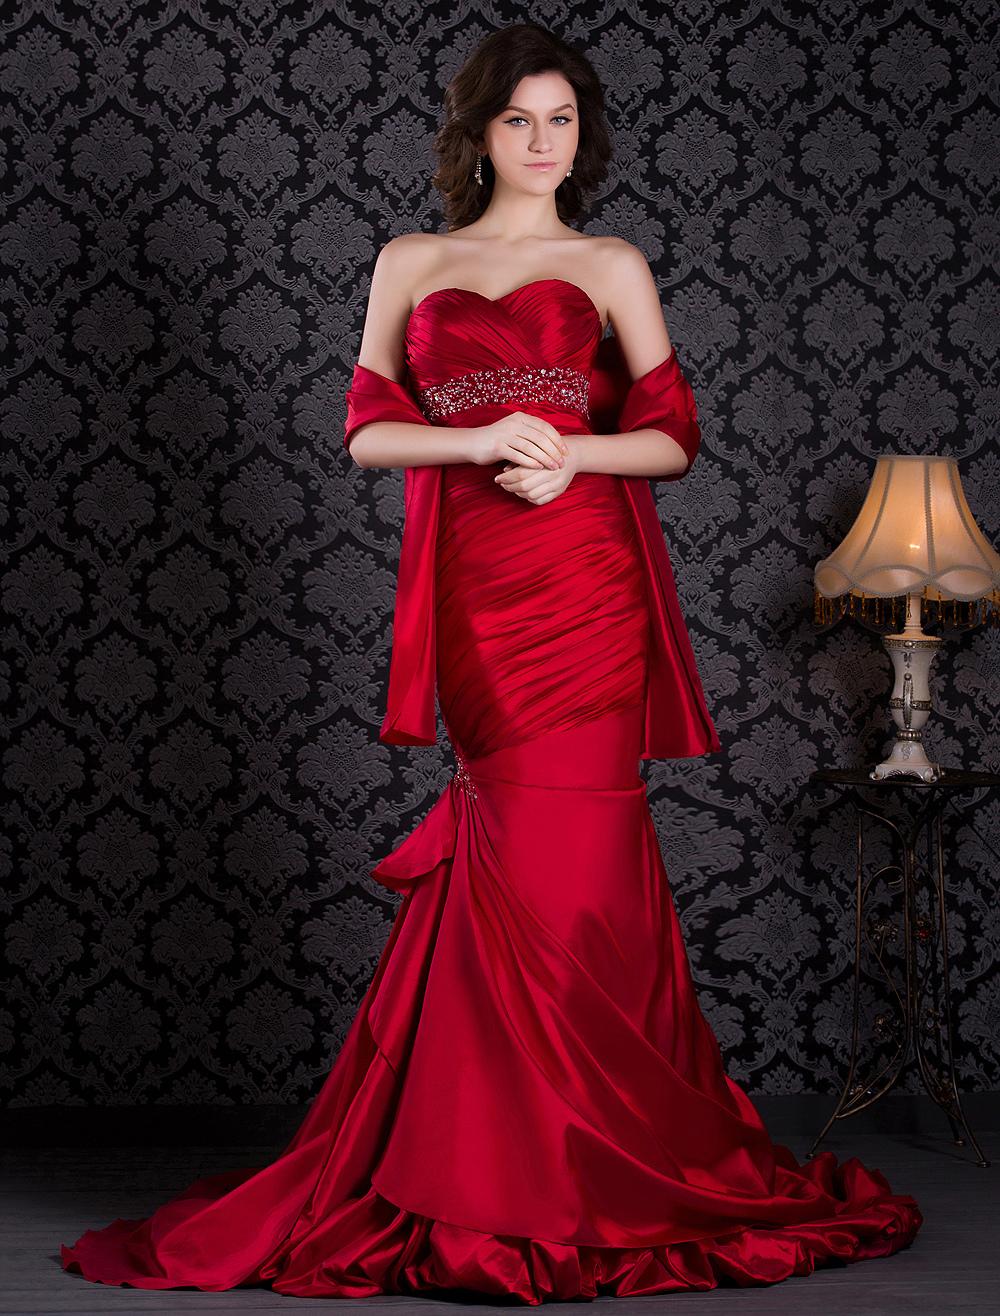 Mermaid Strapless Taffeta Prom Dress with Beading